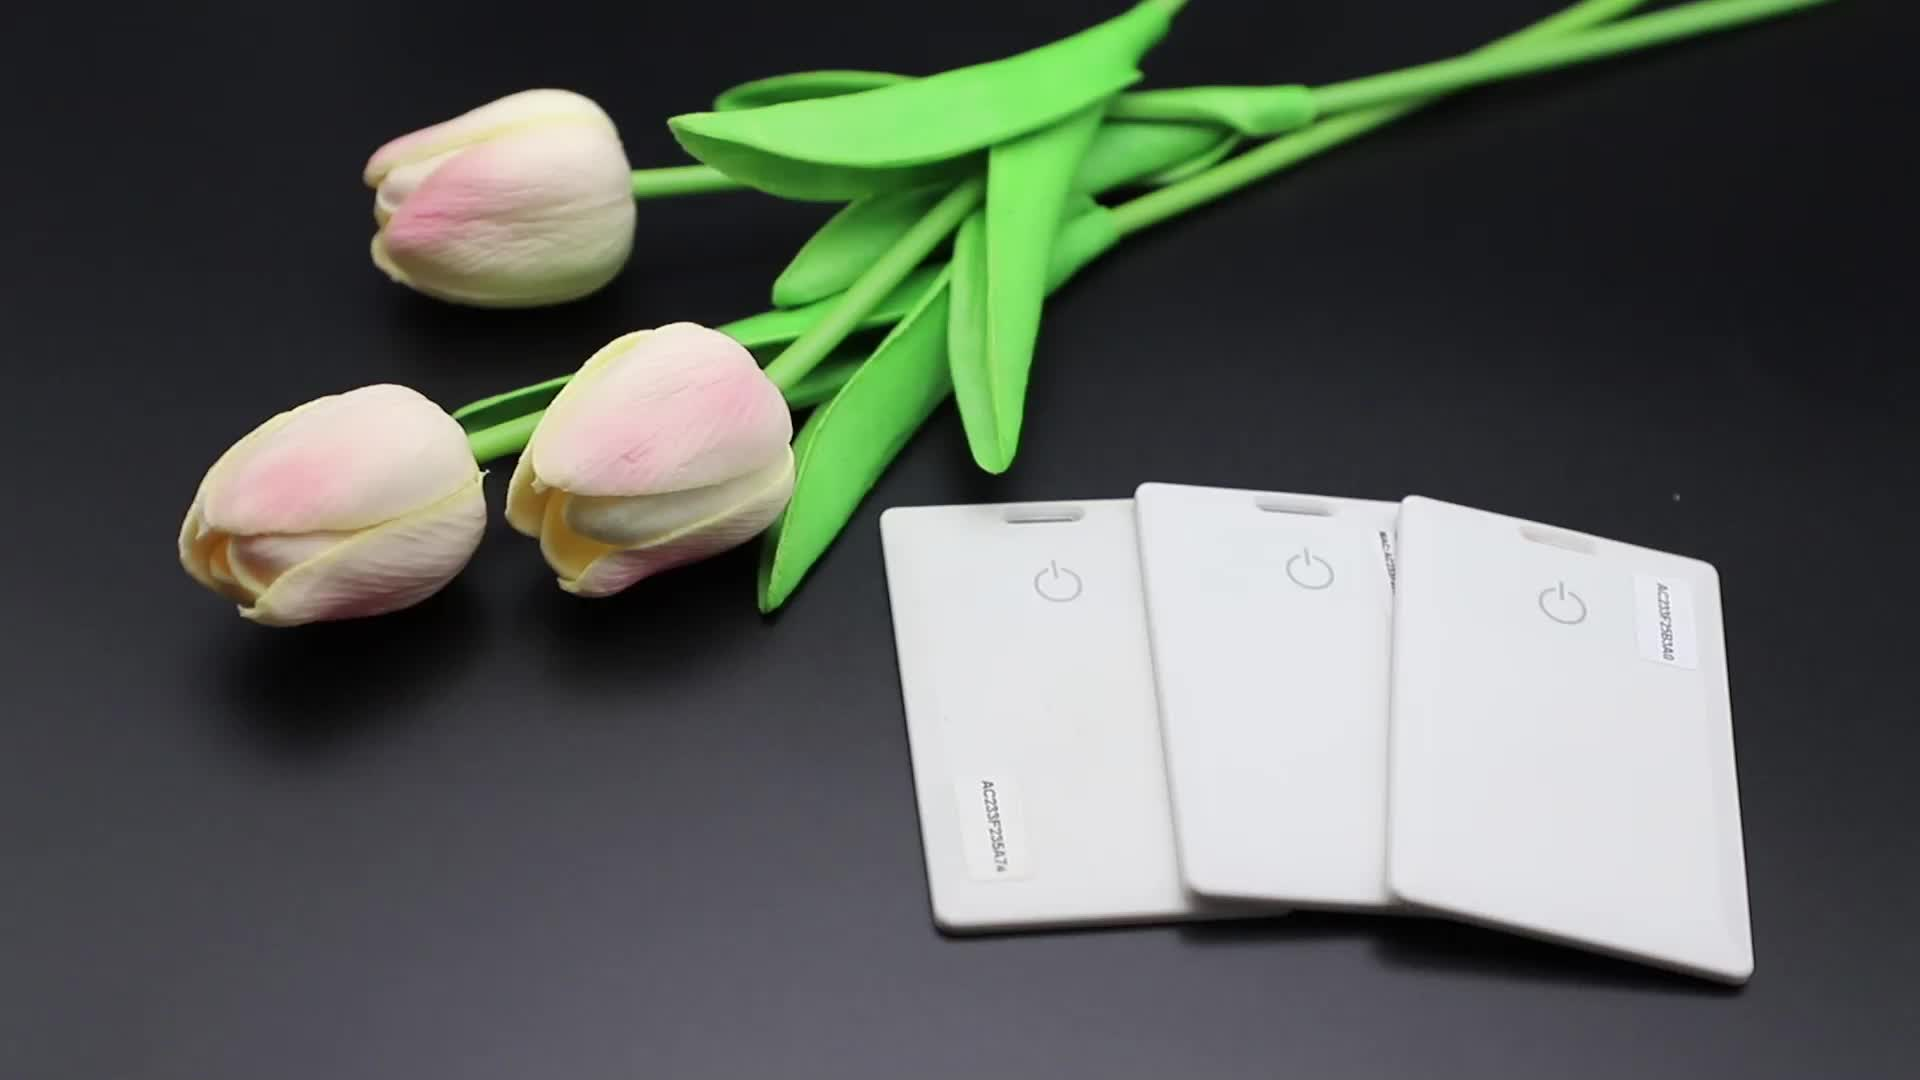 Bluetooth 5.0 hardware BLE Beacon and Eddystone nRF52832 iBeacon